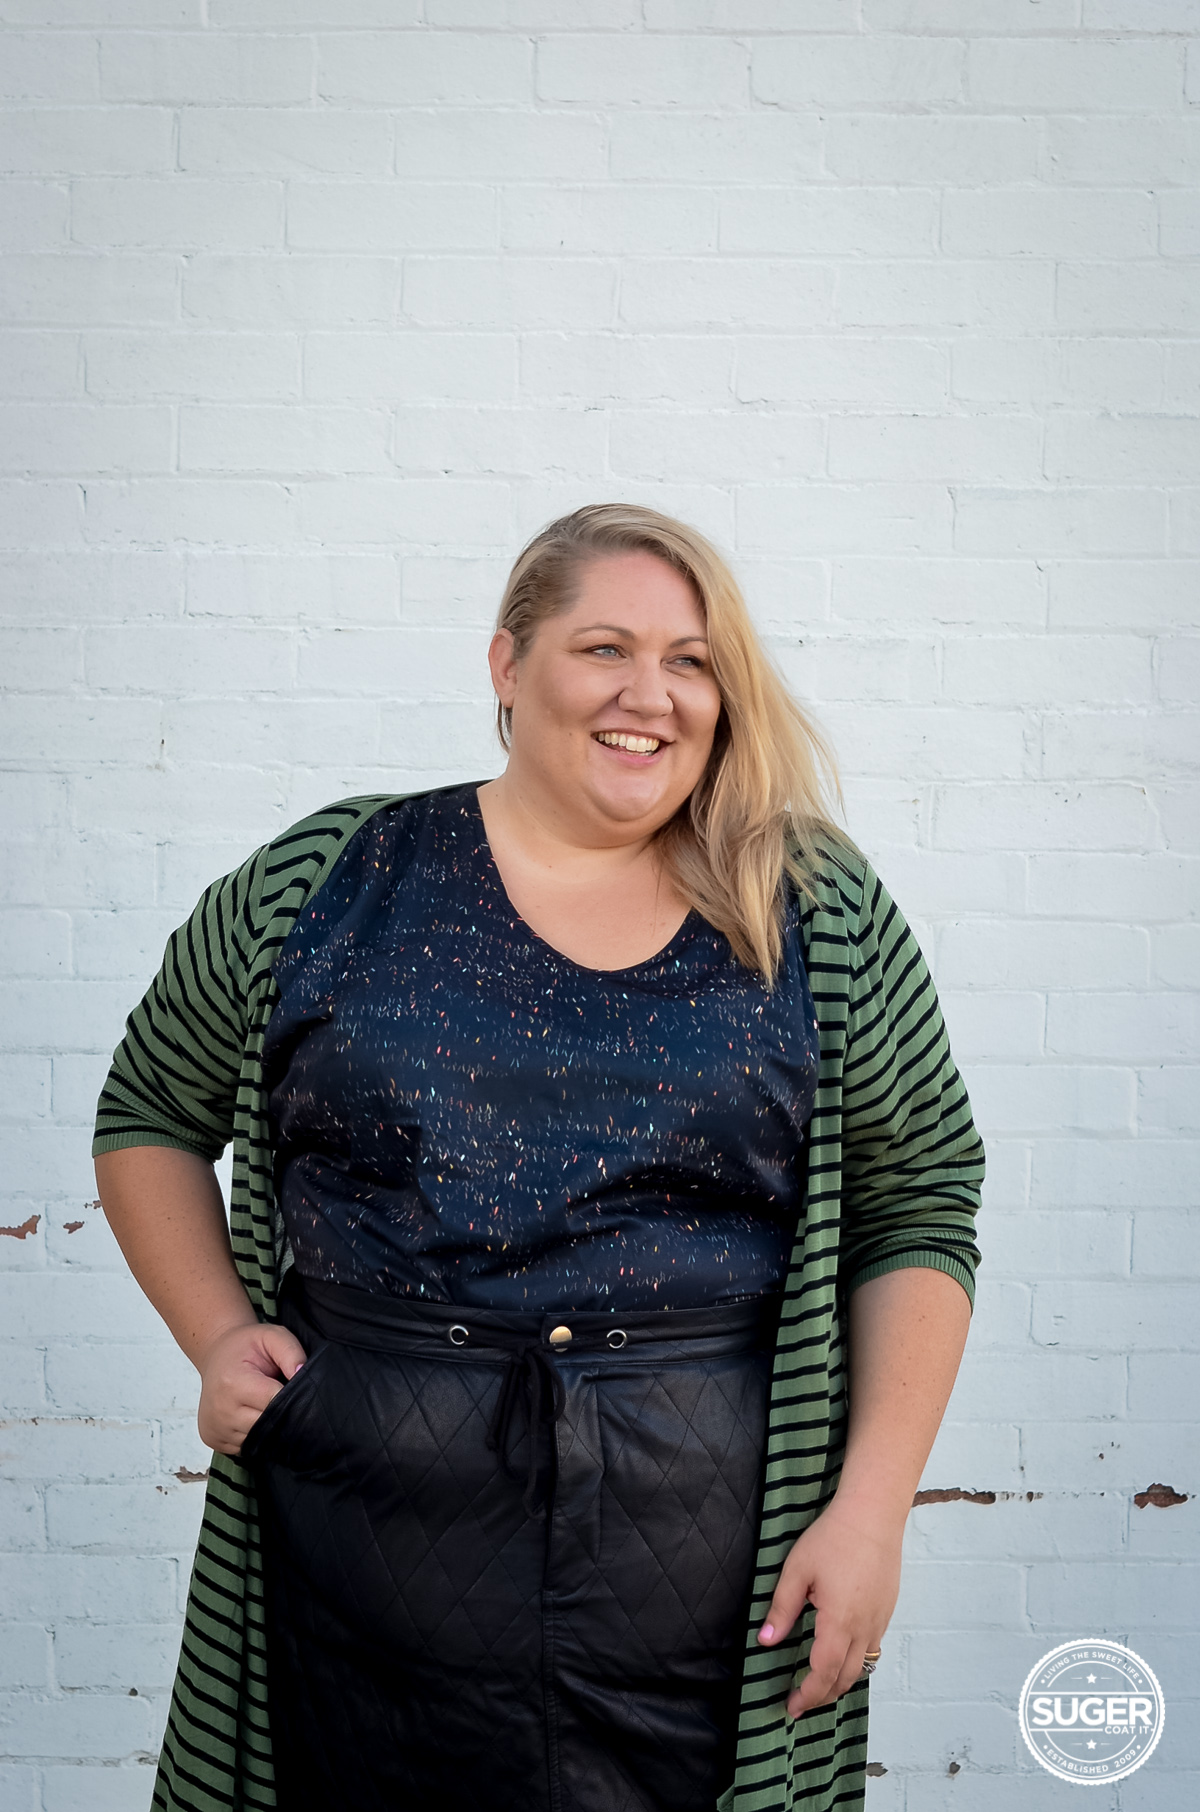 plus size blogger australia 17 sundays aw16 outfit